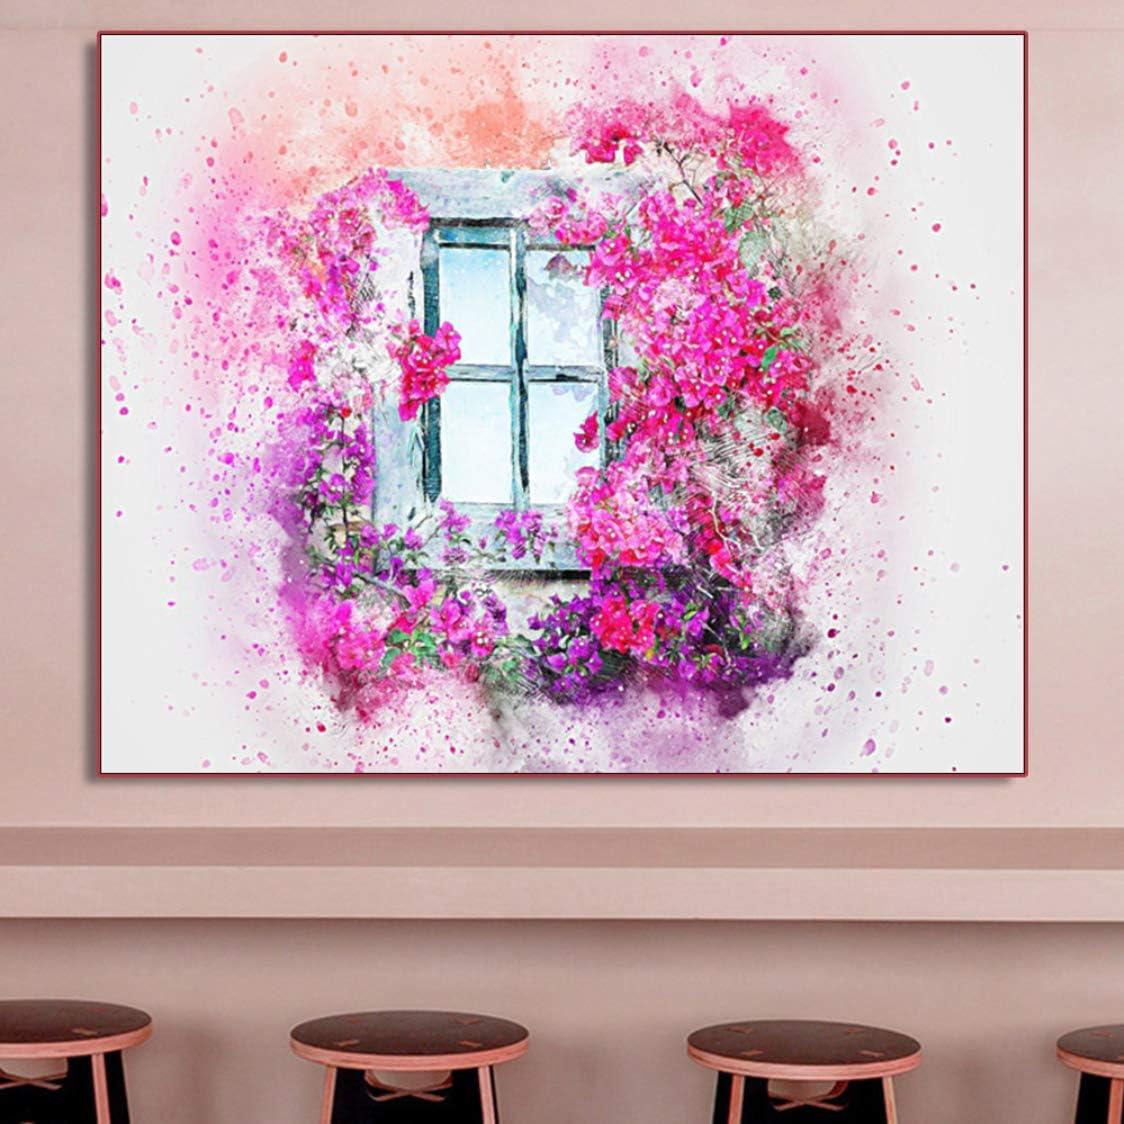 Danjiao Cuadro De Arte De Pared Pintura Al Óleo Abstracta Flores Coloridas Ventana Cuadros Lienzo Pintura Para Sala De Estar Habitación De Niños Decoración Del Hogar Sala De Estar Decor 60x90cm